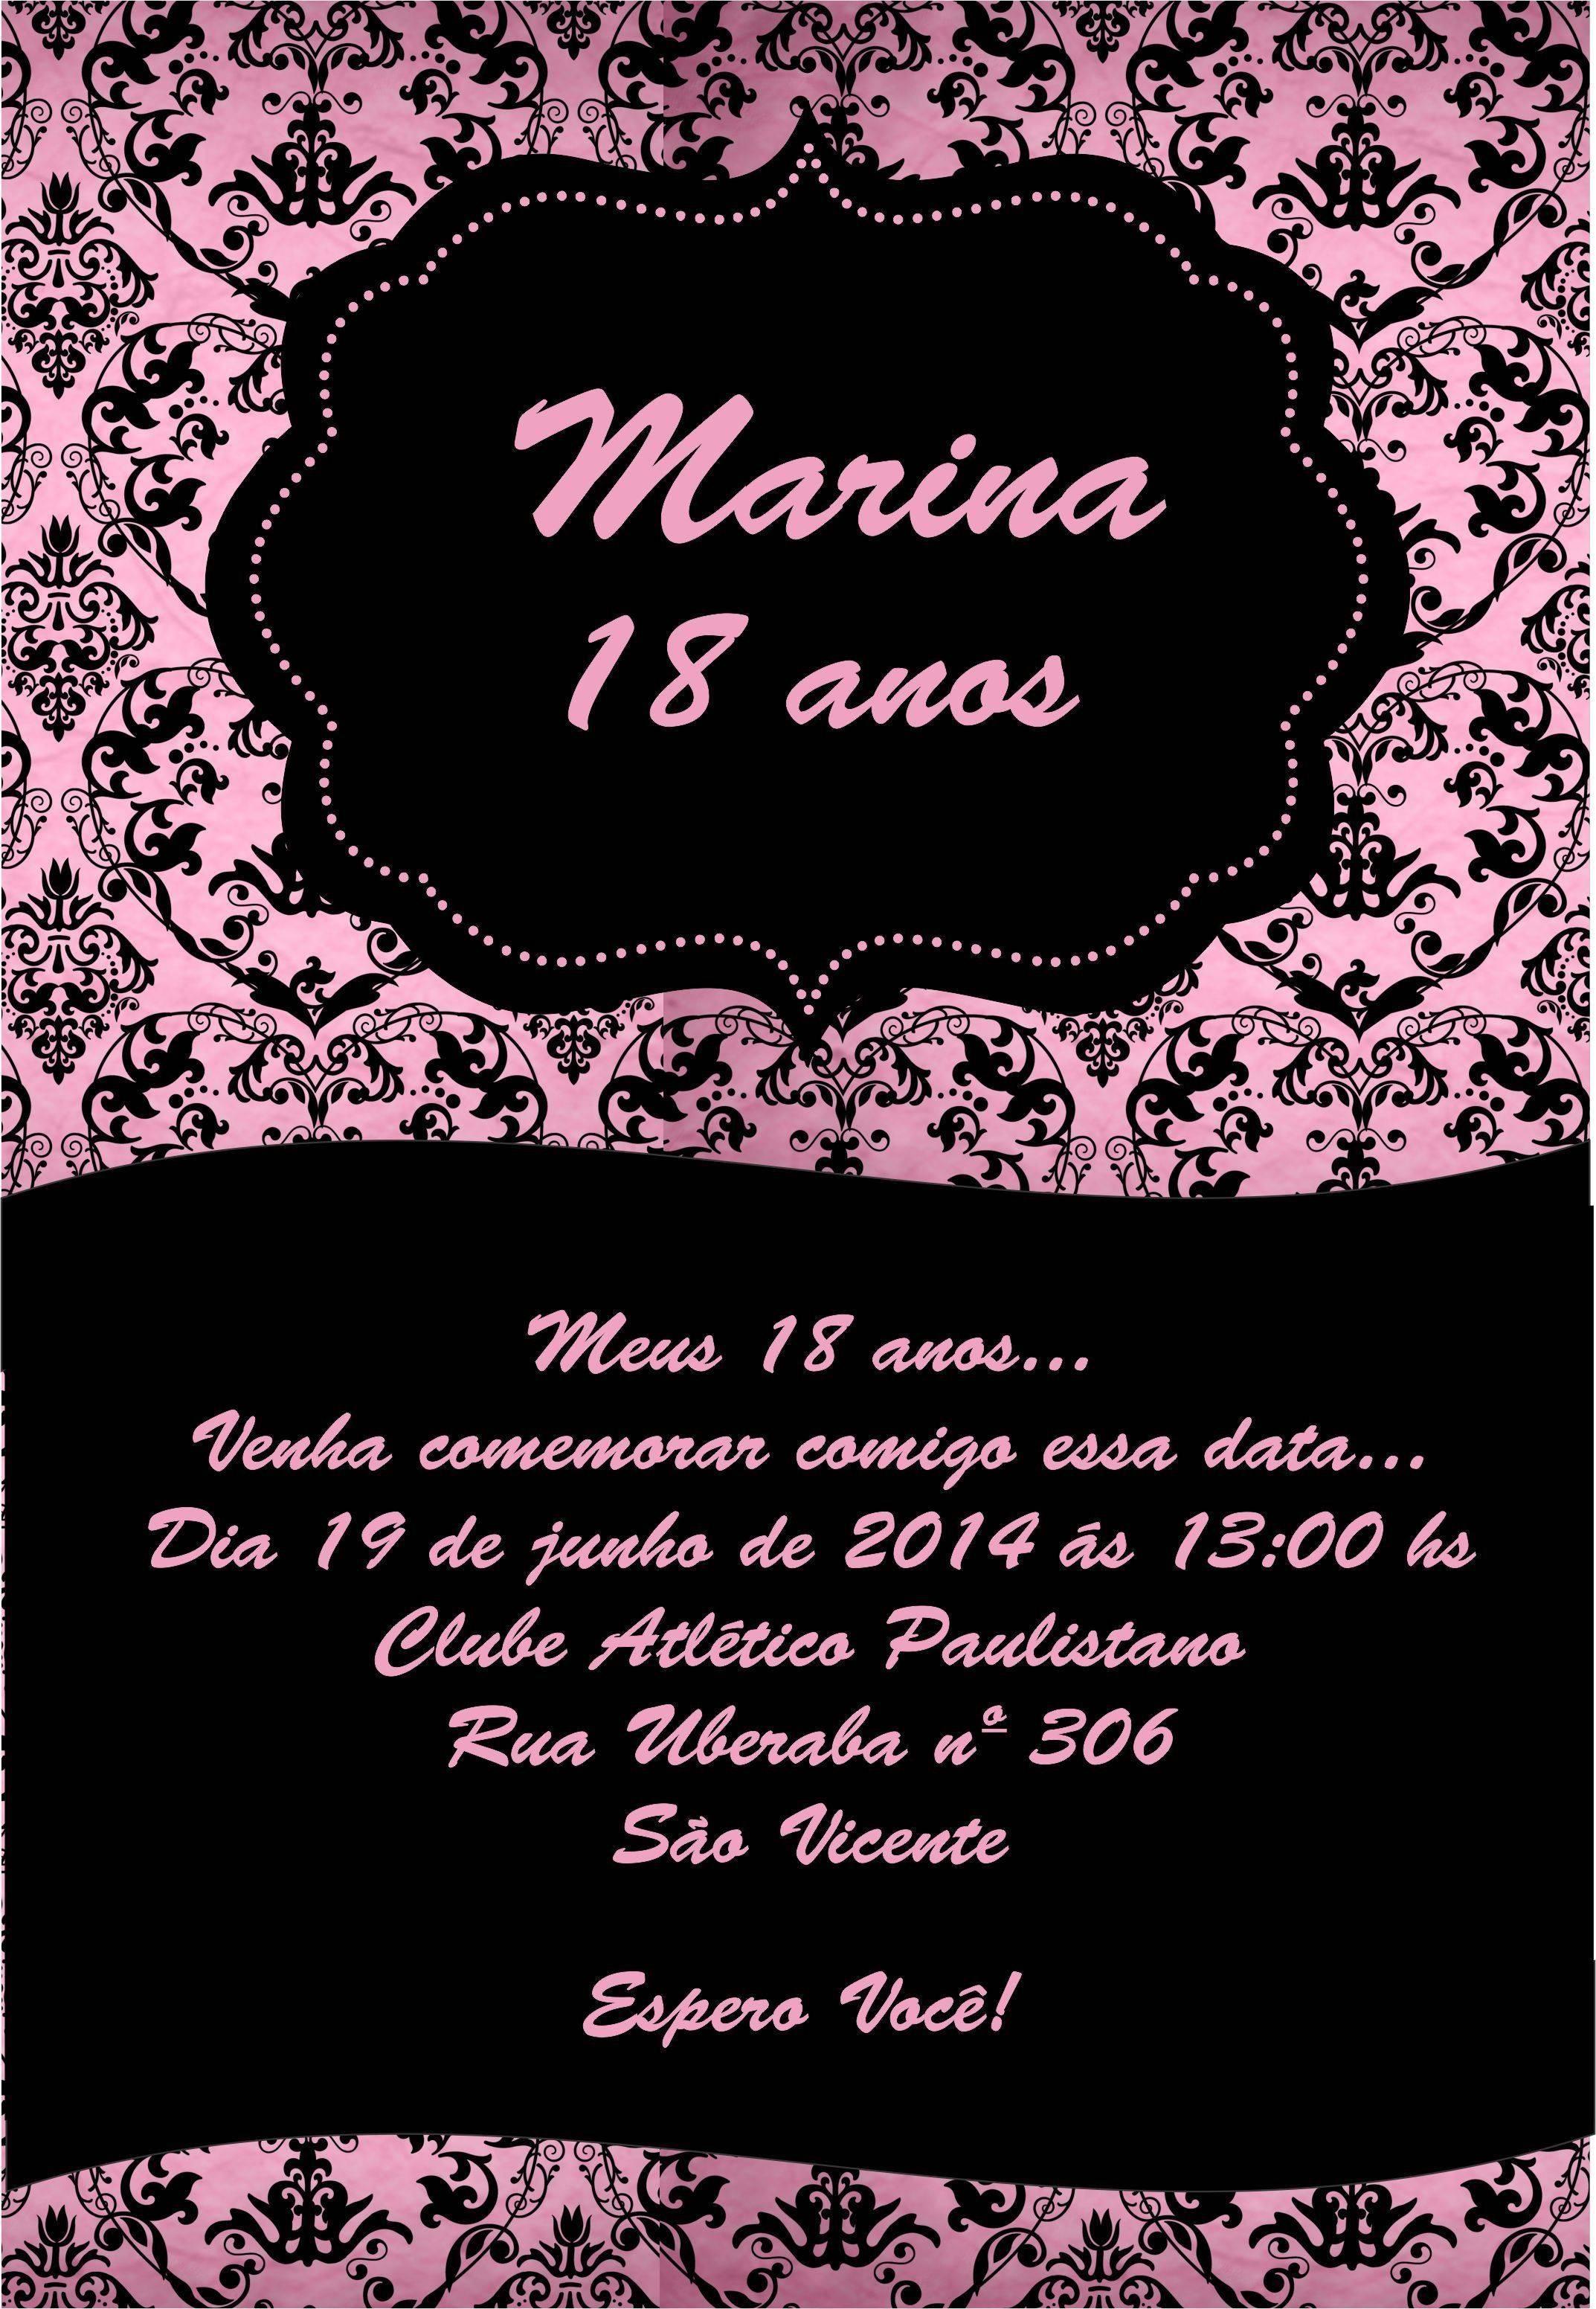 convite-18-anos22